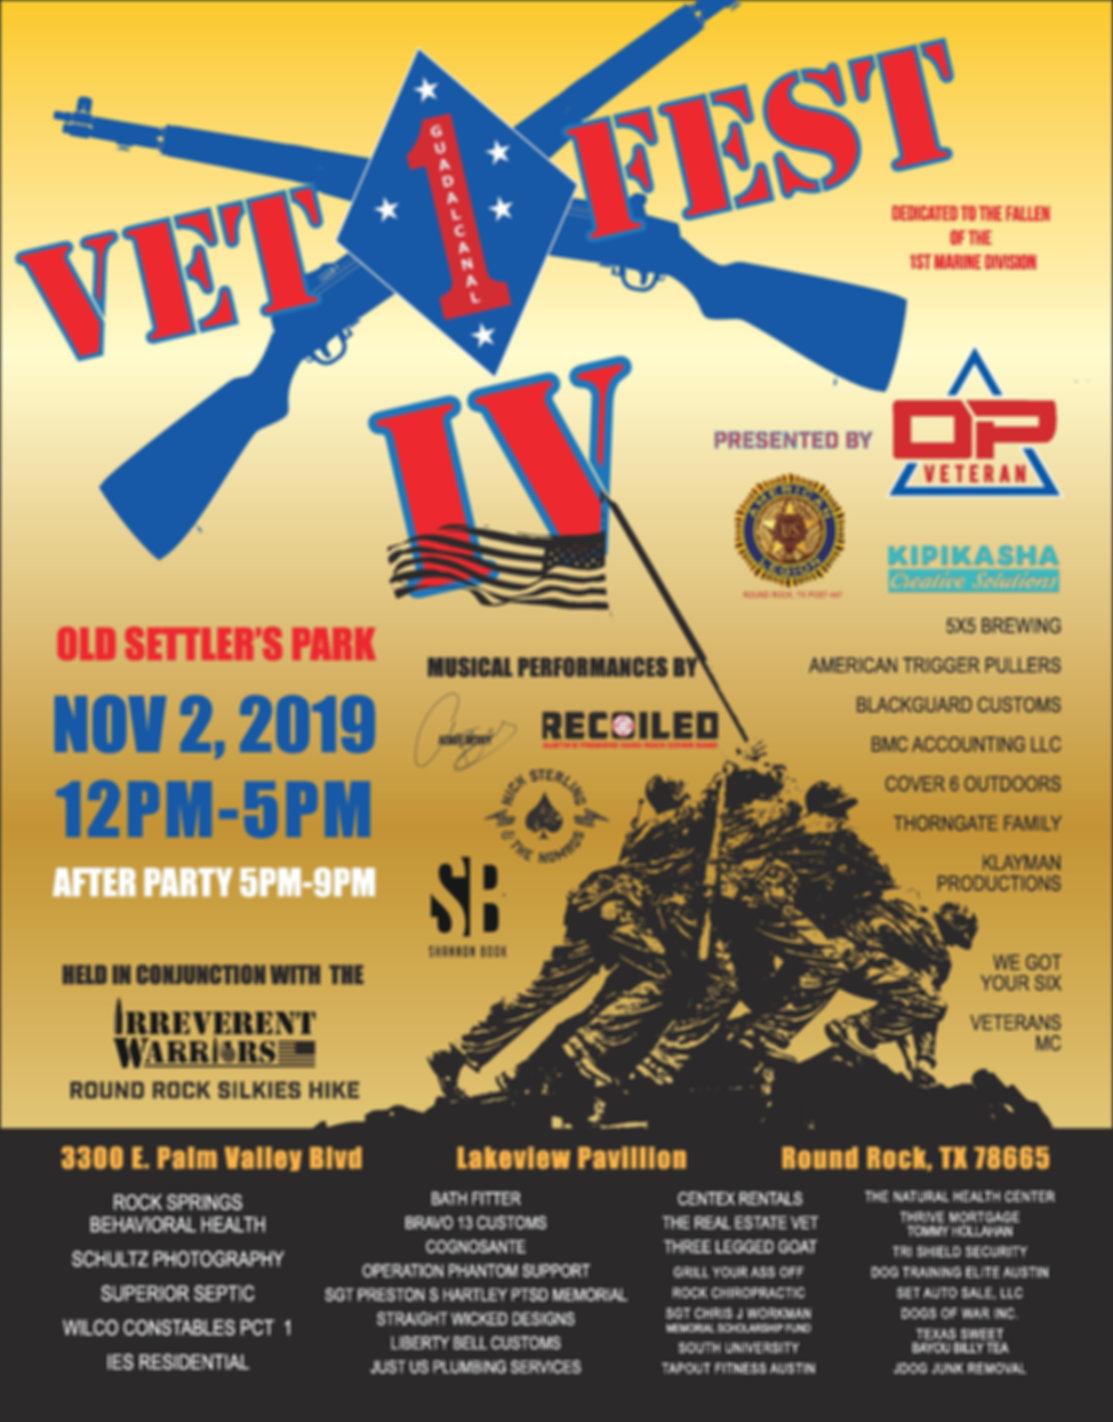 VetFest IV Flier 2019-page-001.jpg